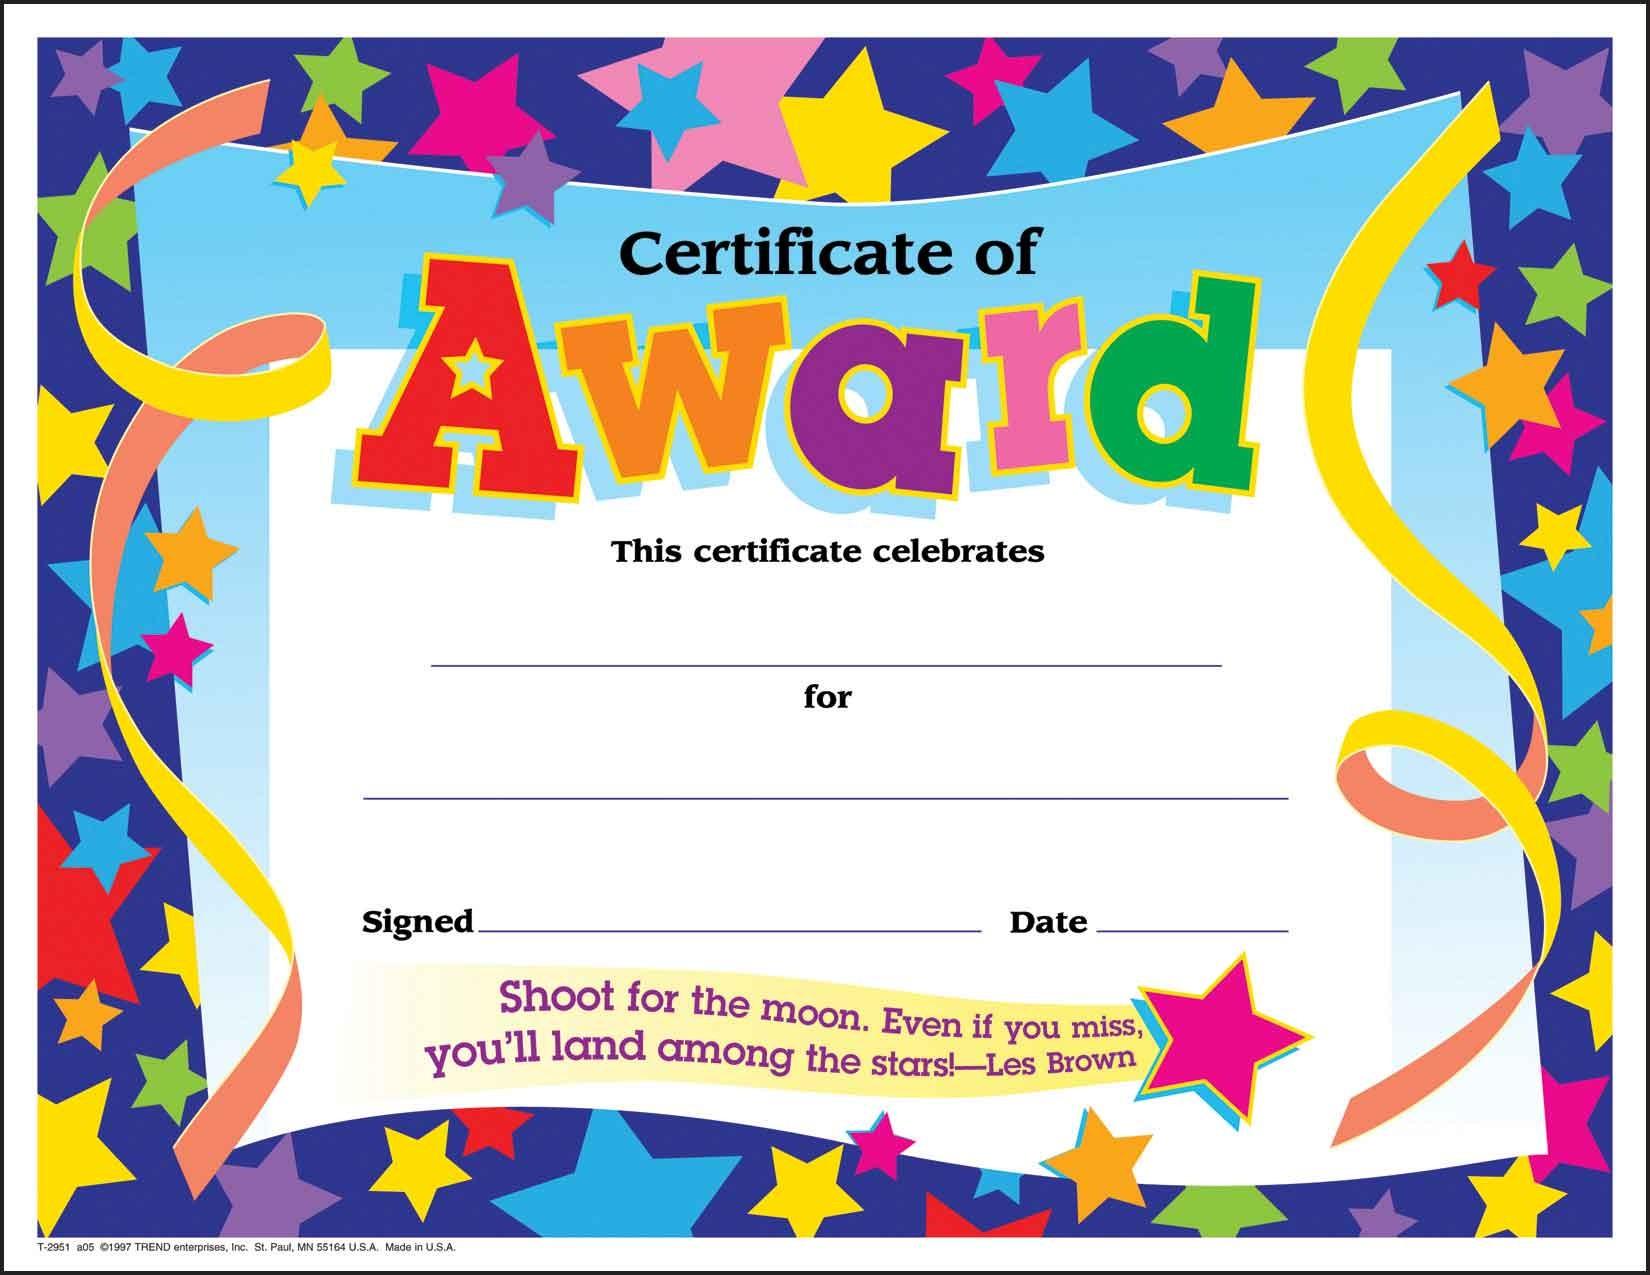 Congratulations Award Certificate Clipart.